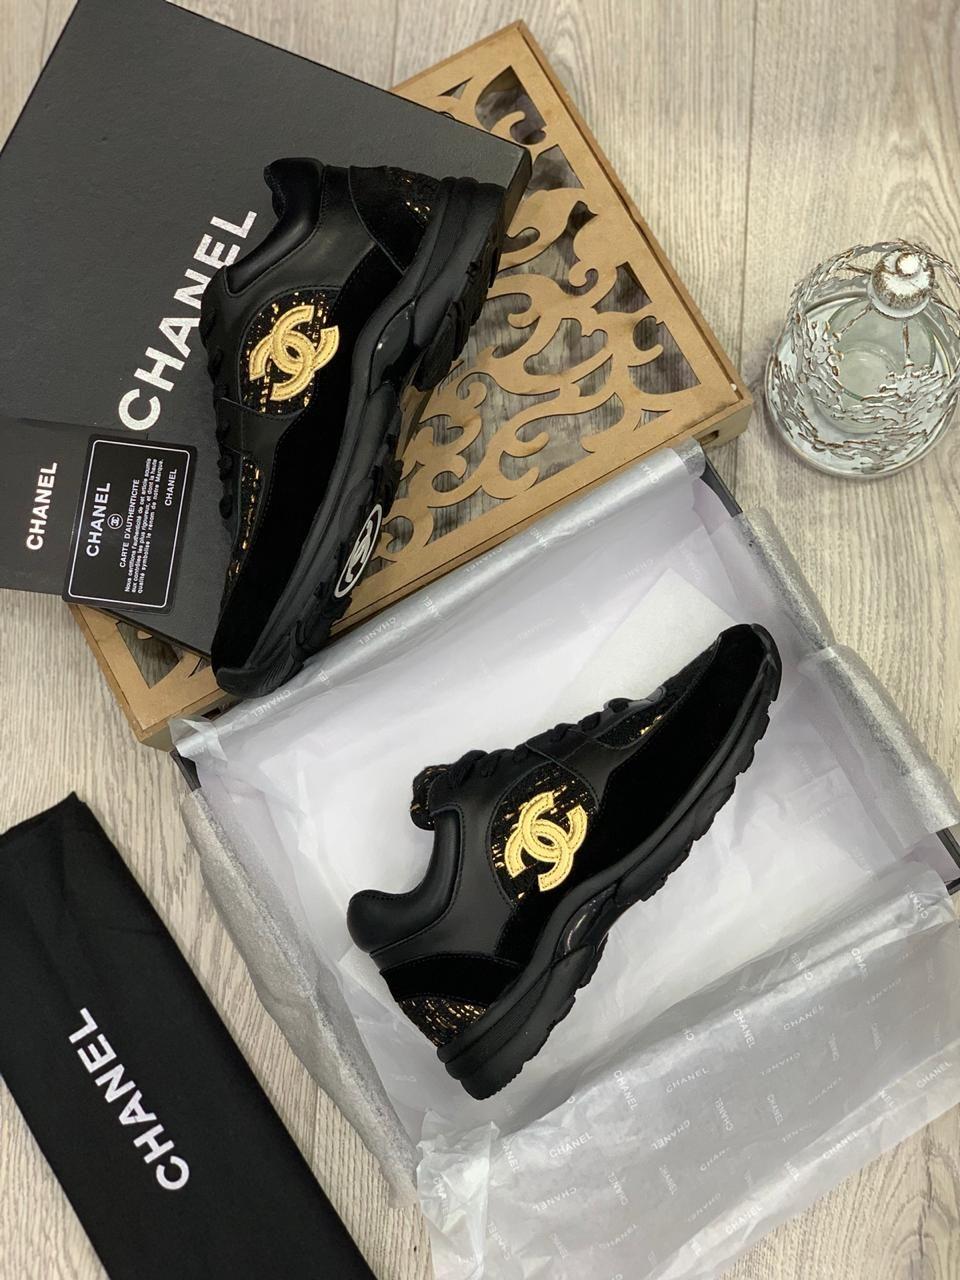 playa Humillar No esencial  Pin by Bag&shose Dubai👠👗👛👓💍👜 on Shoes & dress | Elegant shoes, Trendy  shoes, Sneaker boots